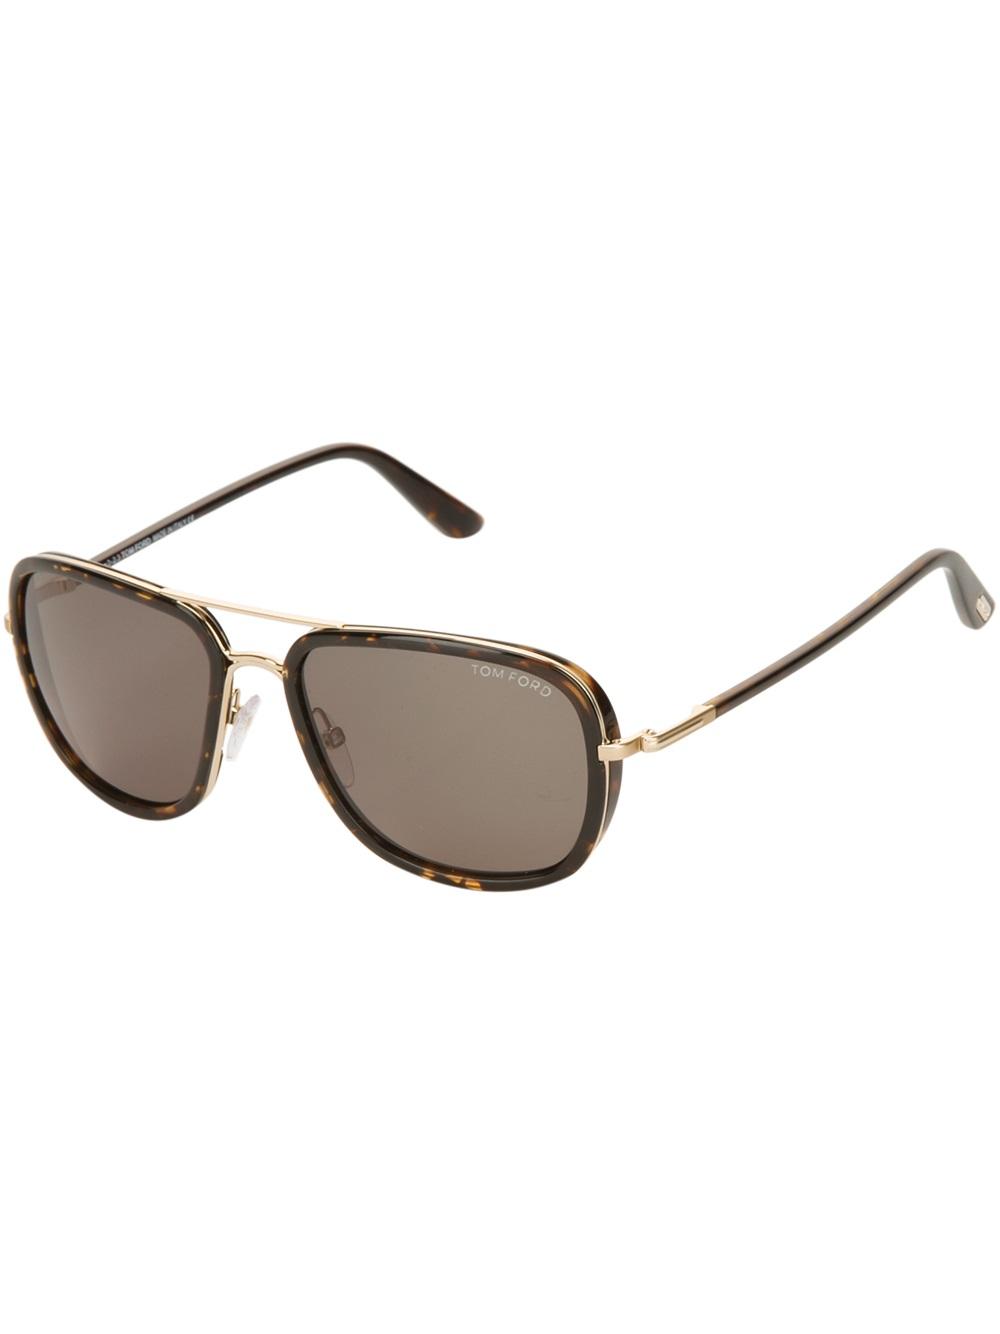 c9cb5ff0e8 Lyst - Tom Ford Square Frame Sunglasses in Brown for Men